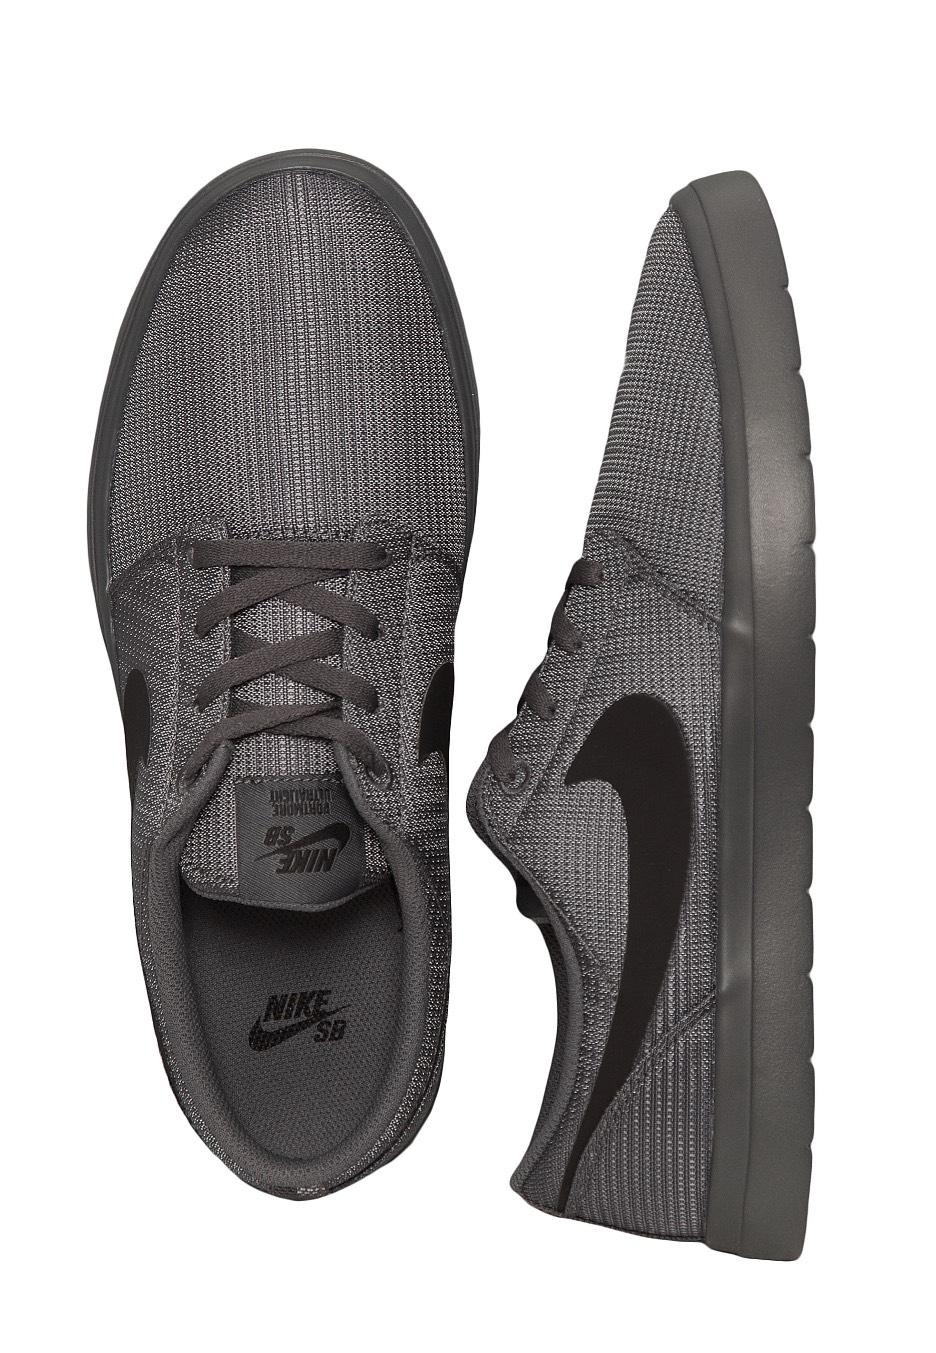 499a9be8813a Nike - SB Portmore II Ultralight Dark Grey Black - Shoes - Streetwear Shop  - Impericon.com US